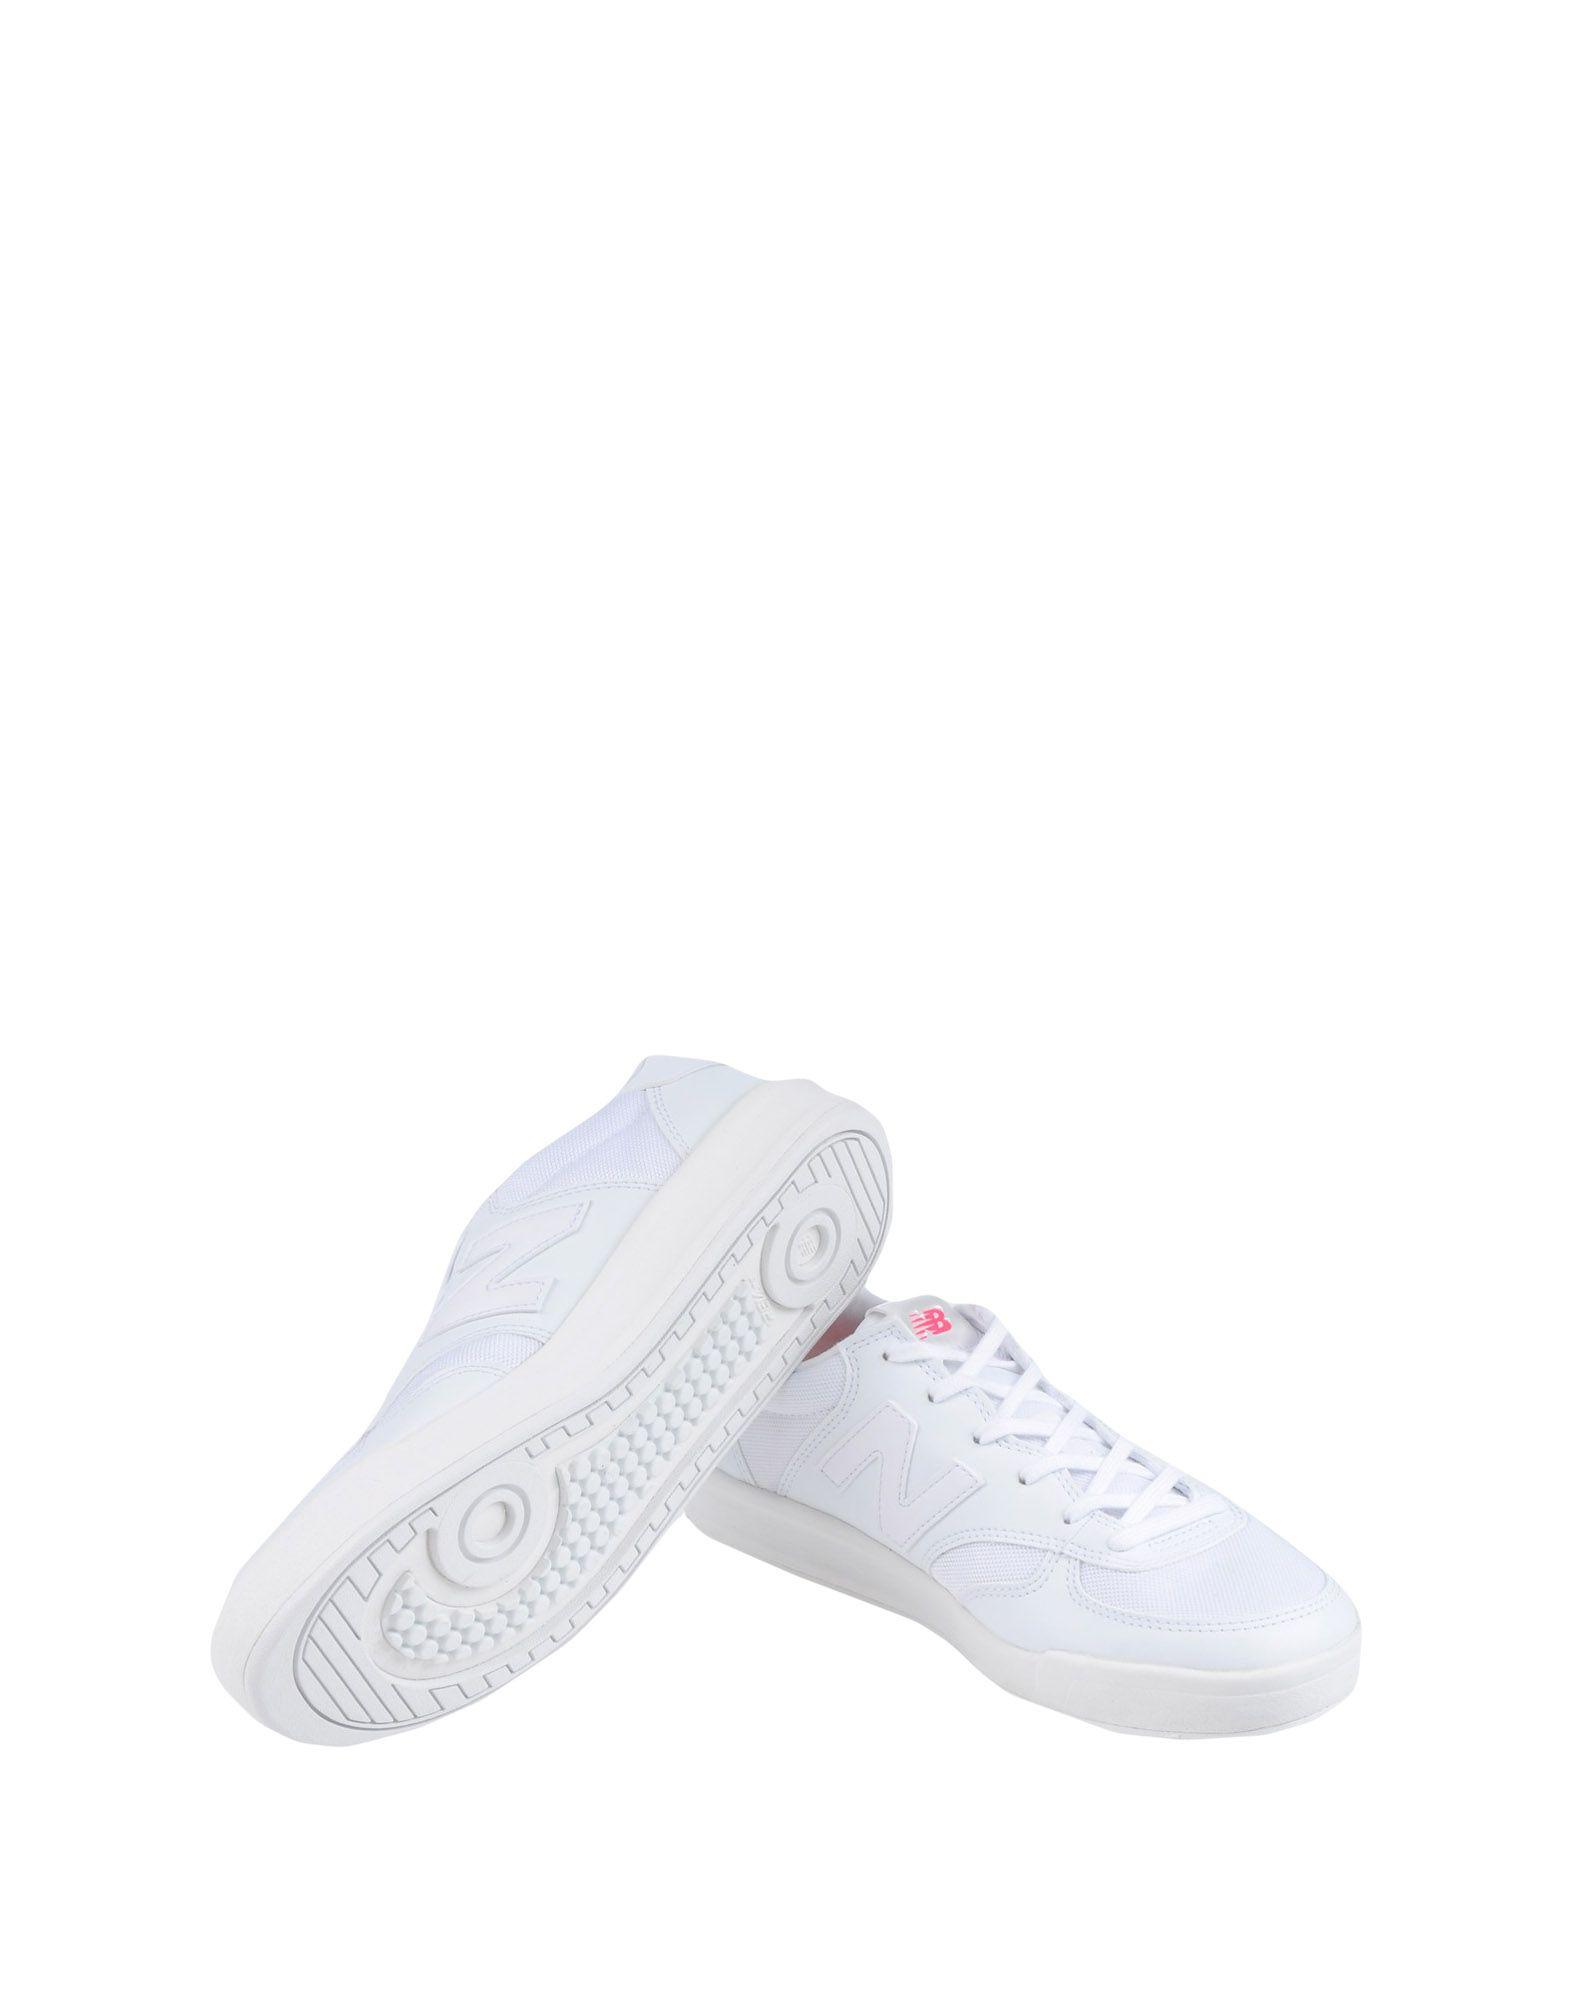 Baskets New Femme White 300 Balance Sauvages 8N0mnw